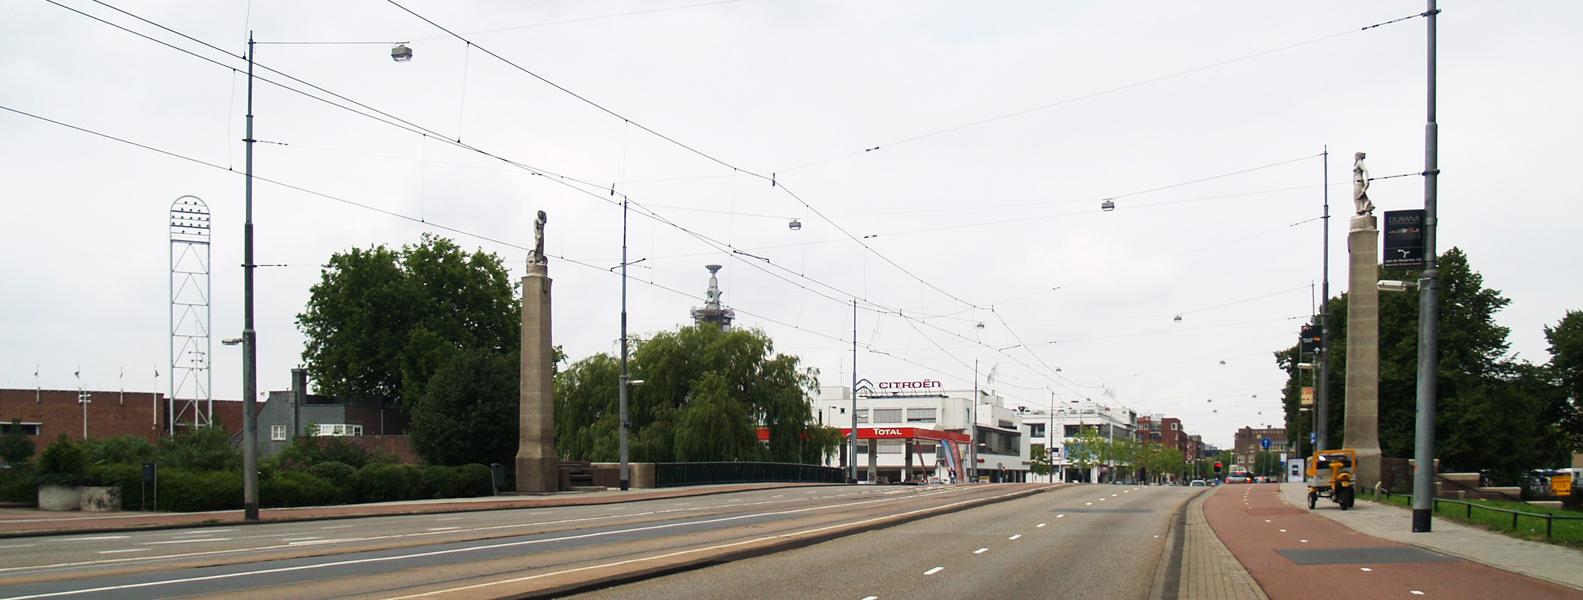 stadionbrug - foto: loek van vlerken 27.07.2011